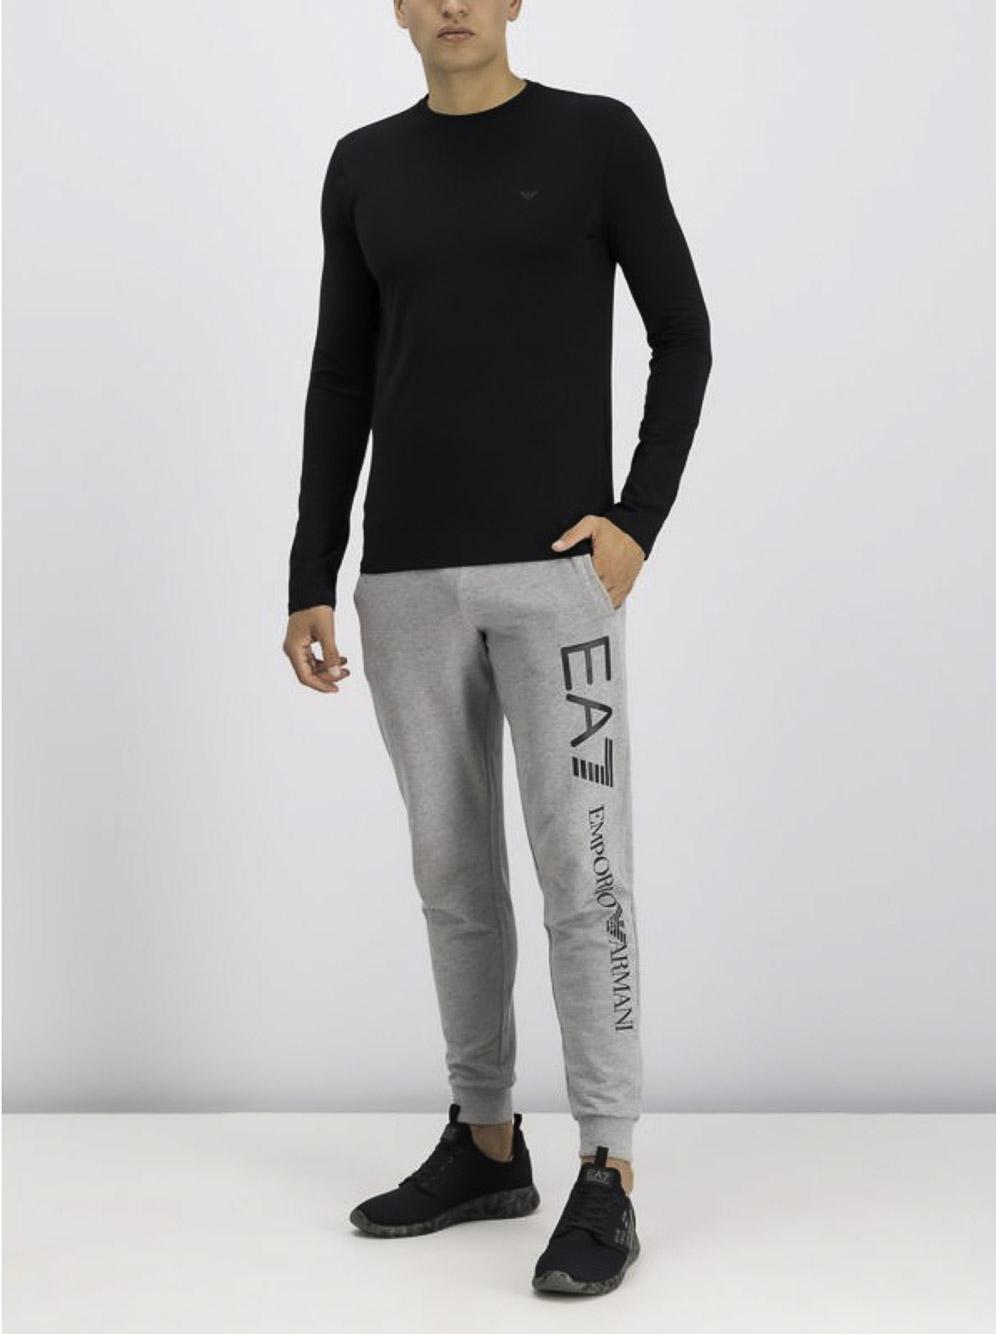 EMPORIO ARMANI Μπλούζα T-Shirt 8N1T81 1J0AZ ΜΑΥΡΟ